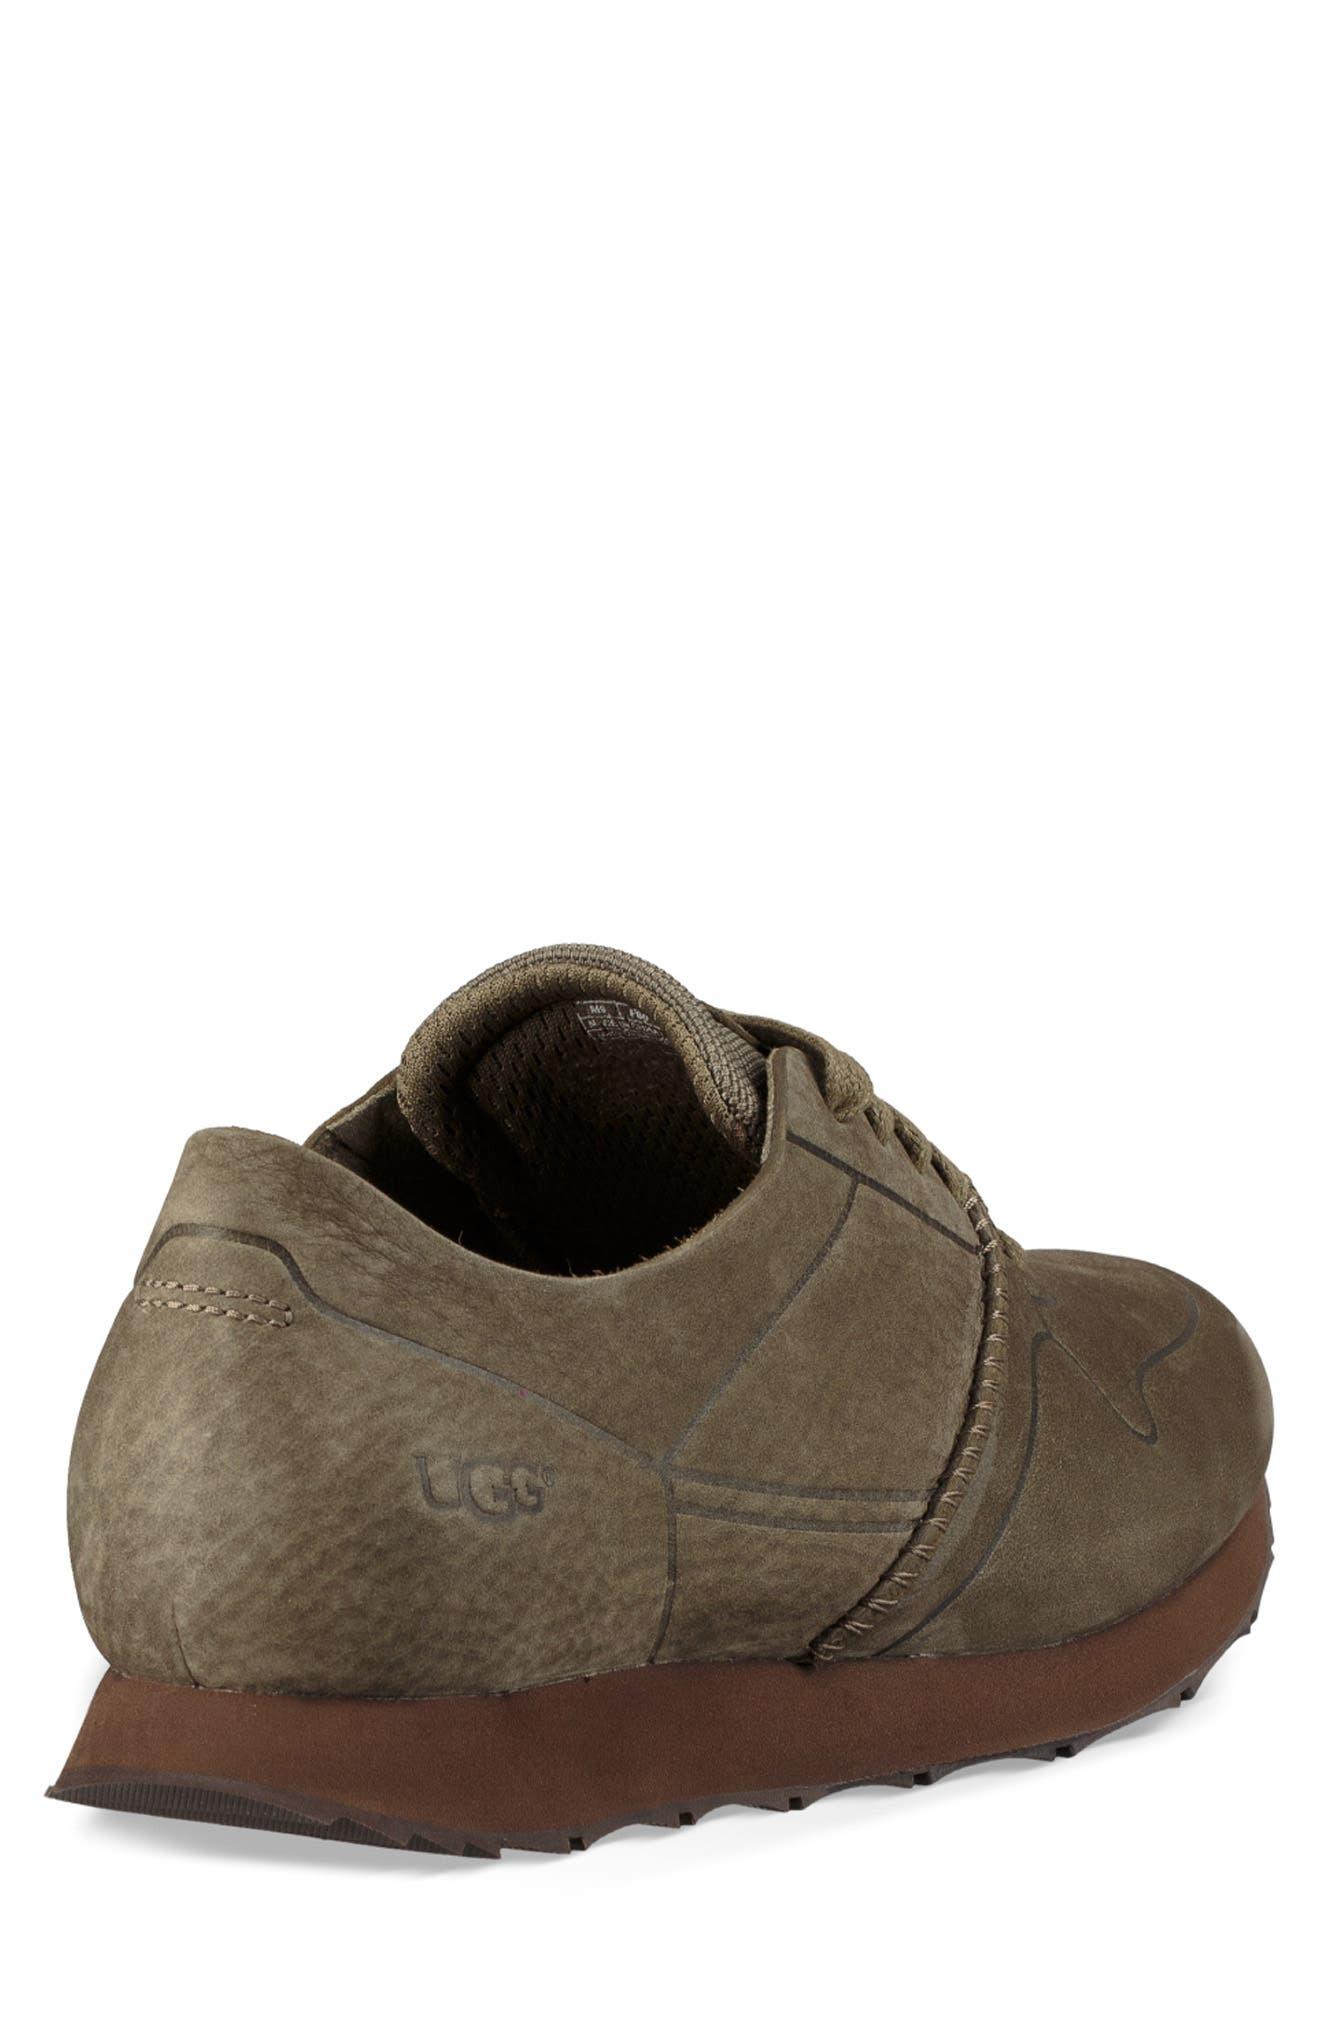 Trigo Unlined Sneaker,                             Alternate thumbnail 2, color,                             MOSS GREEN